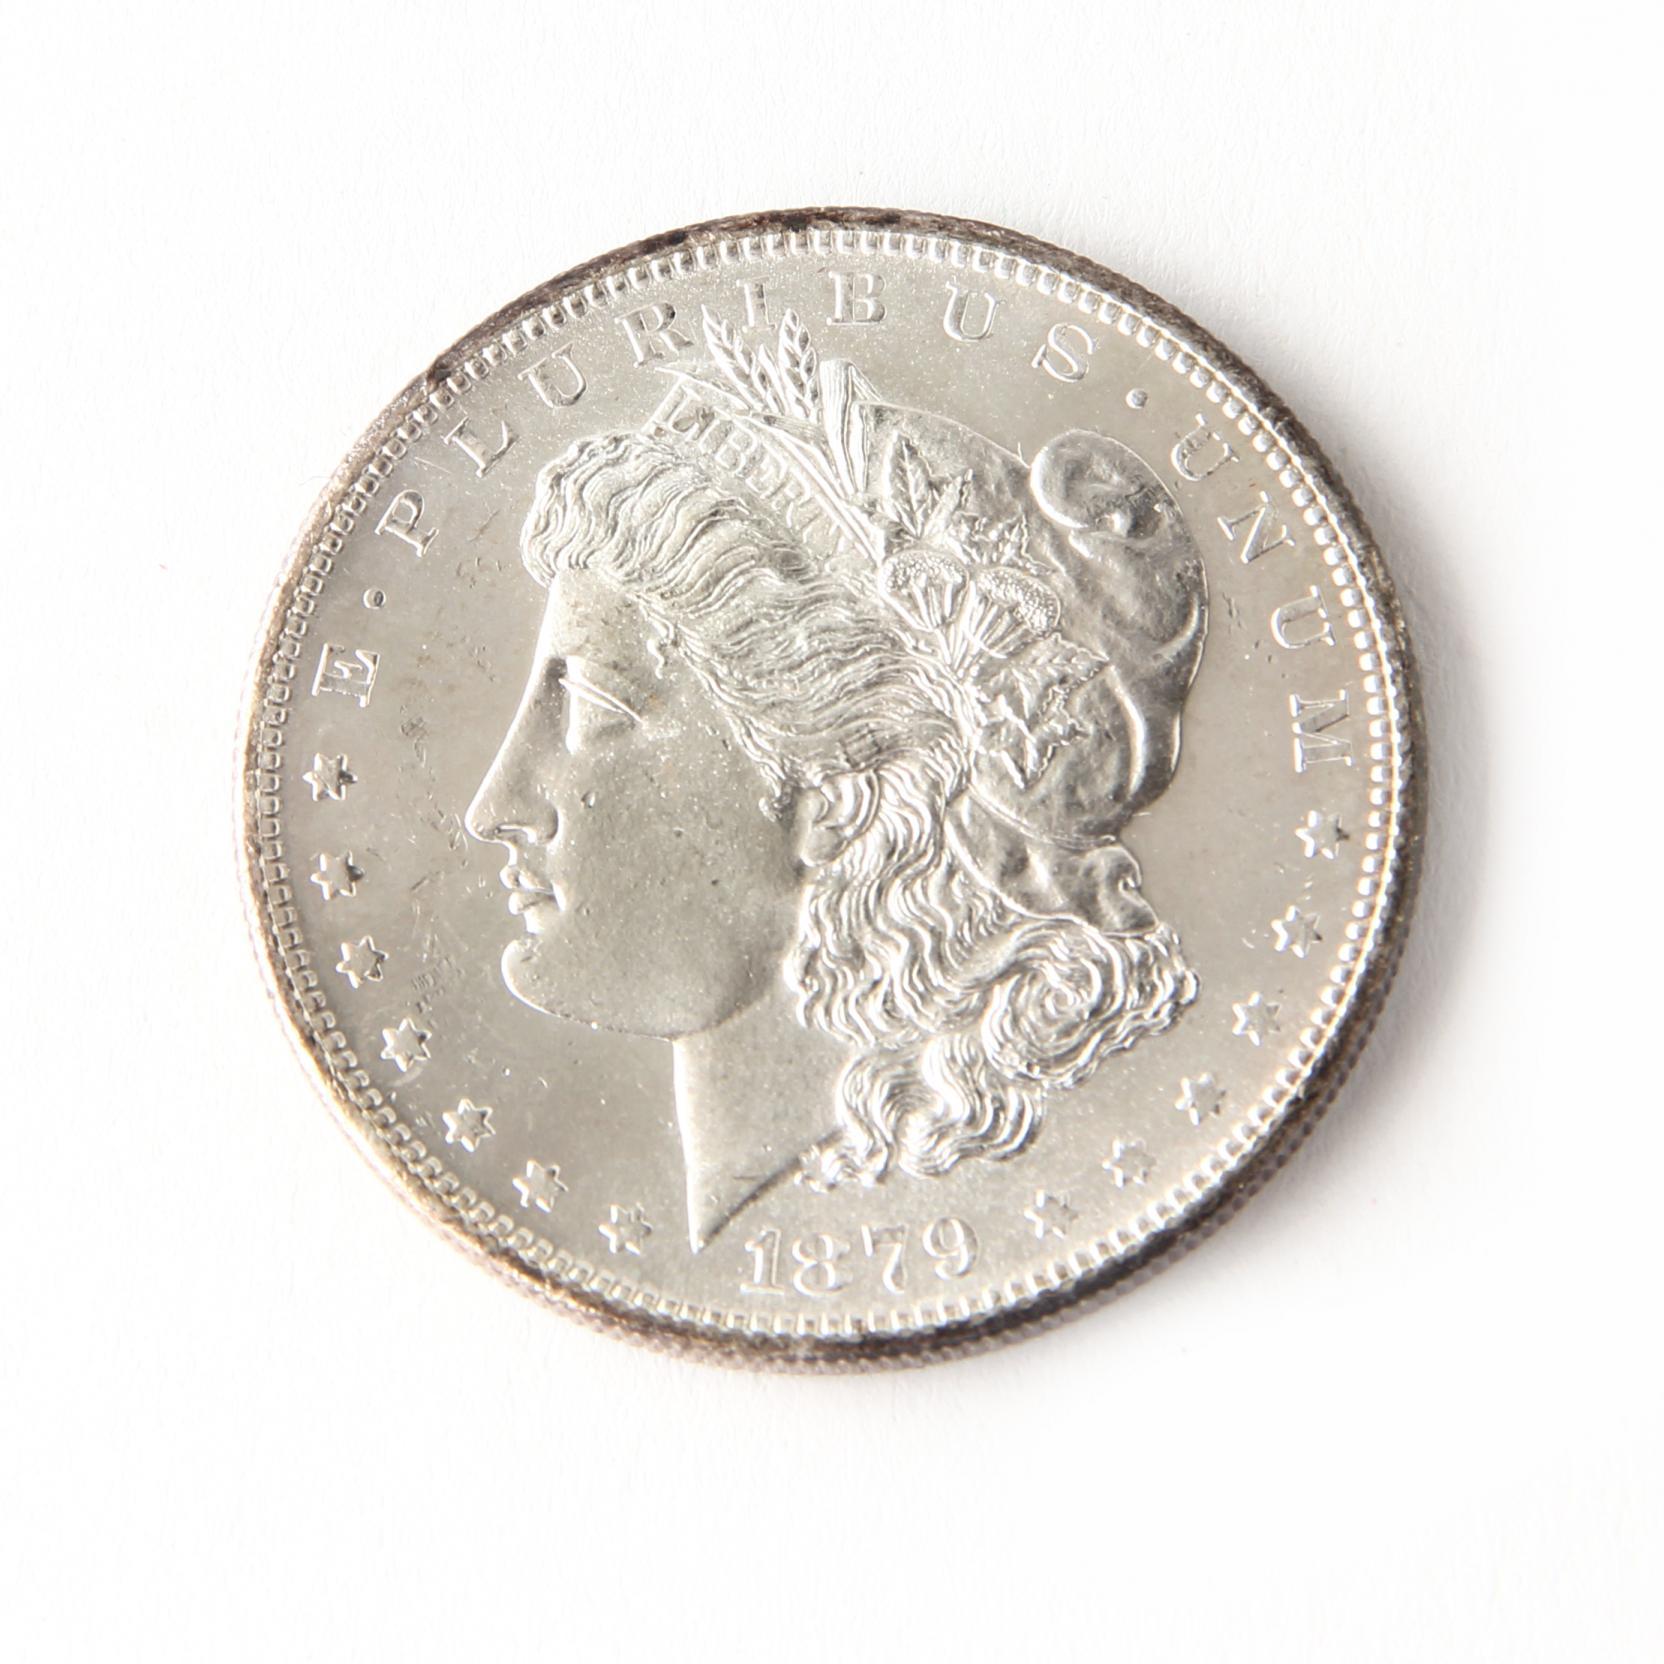 lustrous-brilliant-uncirculated-1879-morgan-silver-dollar